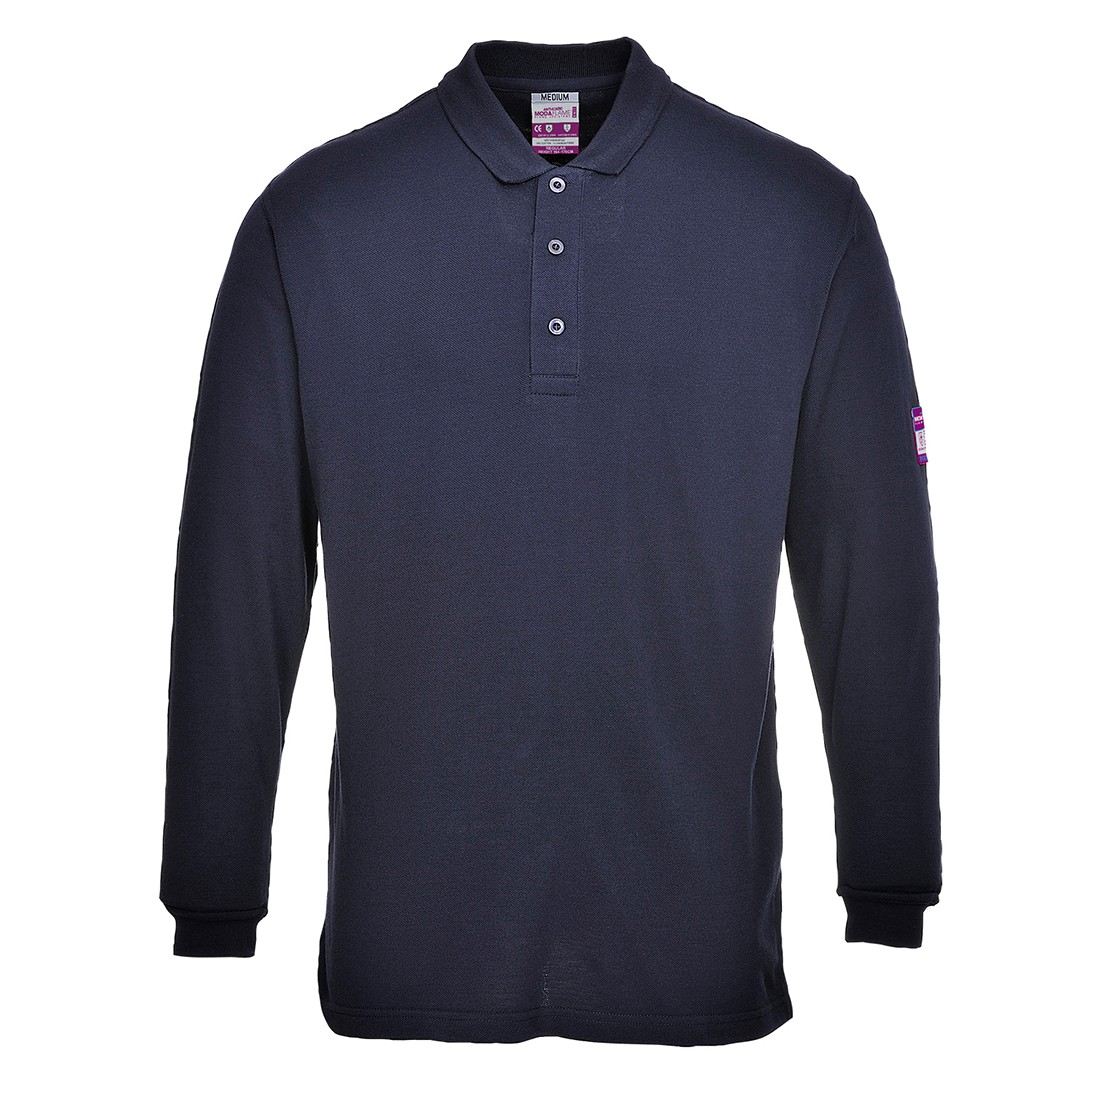 Vlamvertragende Antistatische lange mouw Polo Shirt